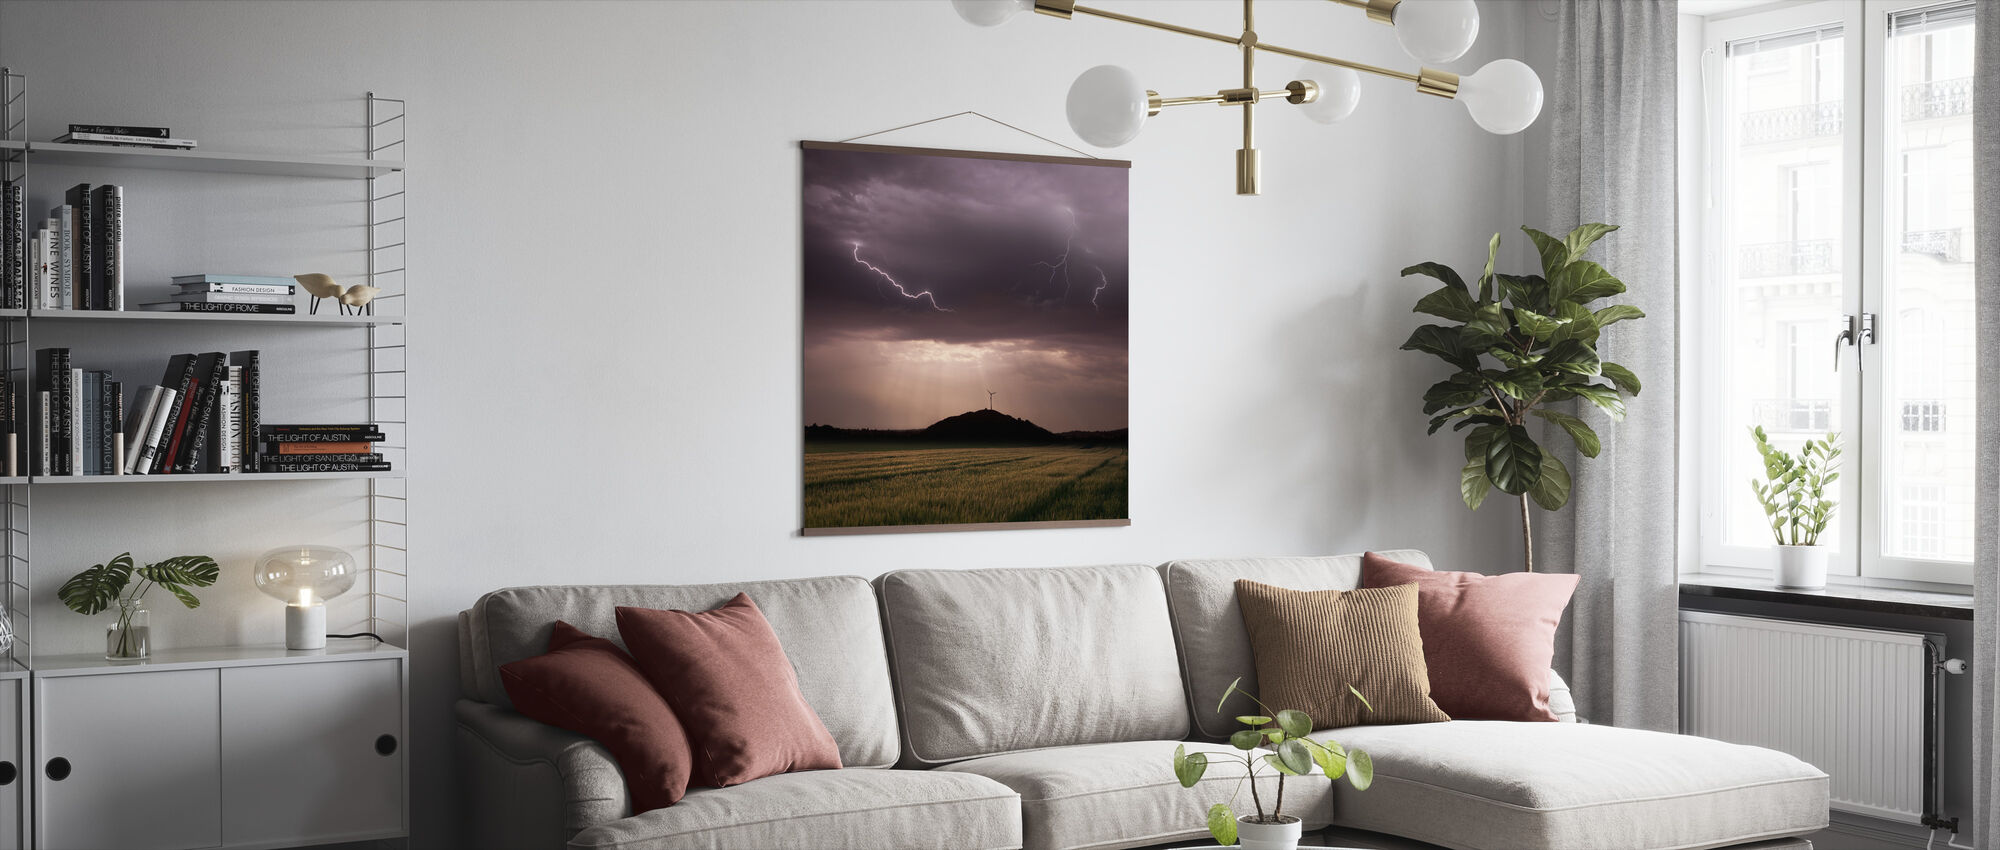 Morning Thunderstorm - Poster - Living Room